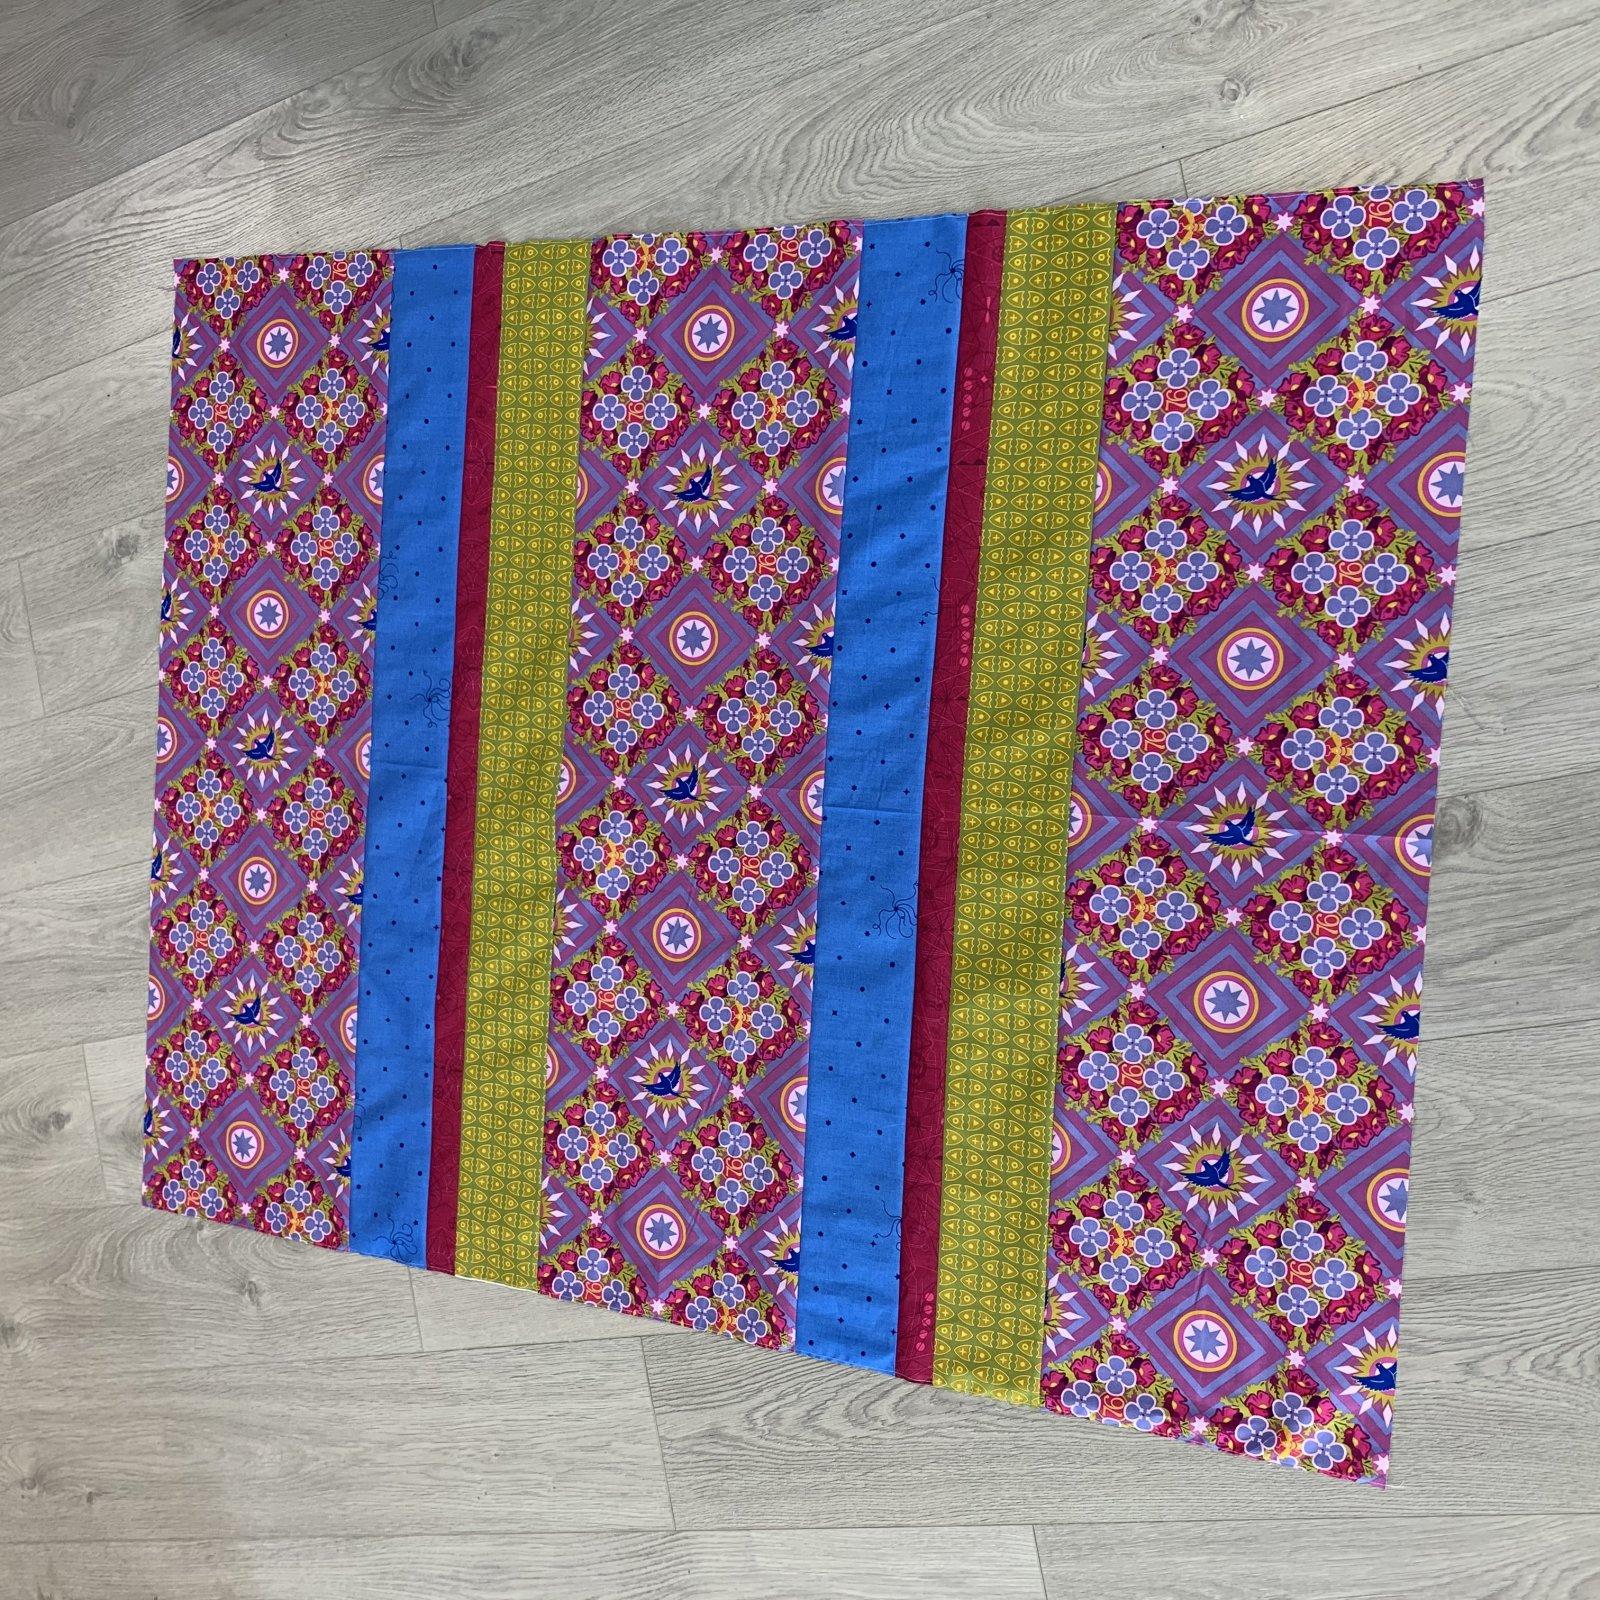 Strip Quilt - Alison Glass 2